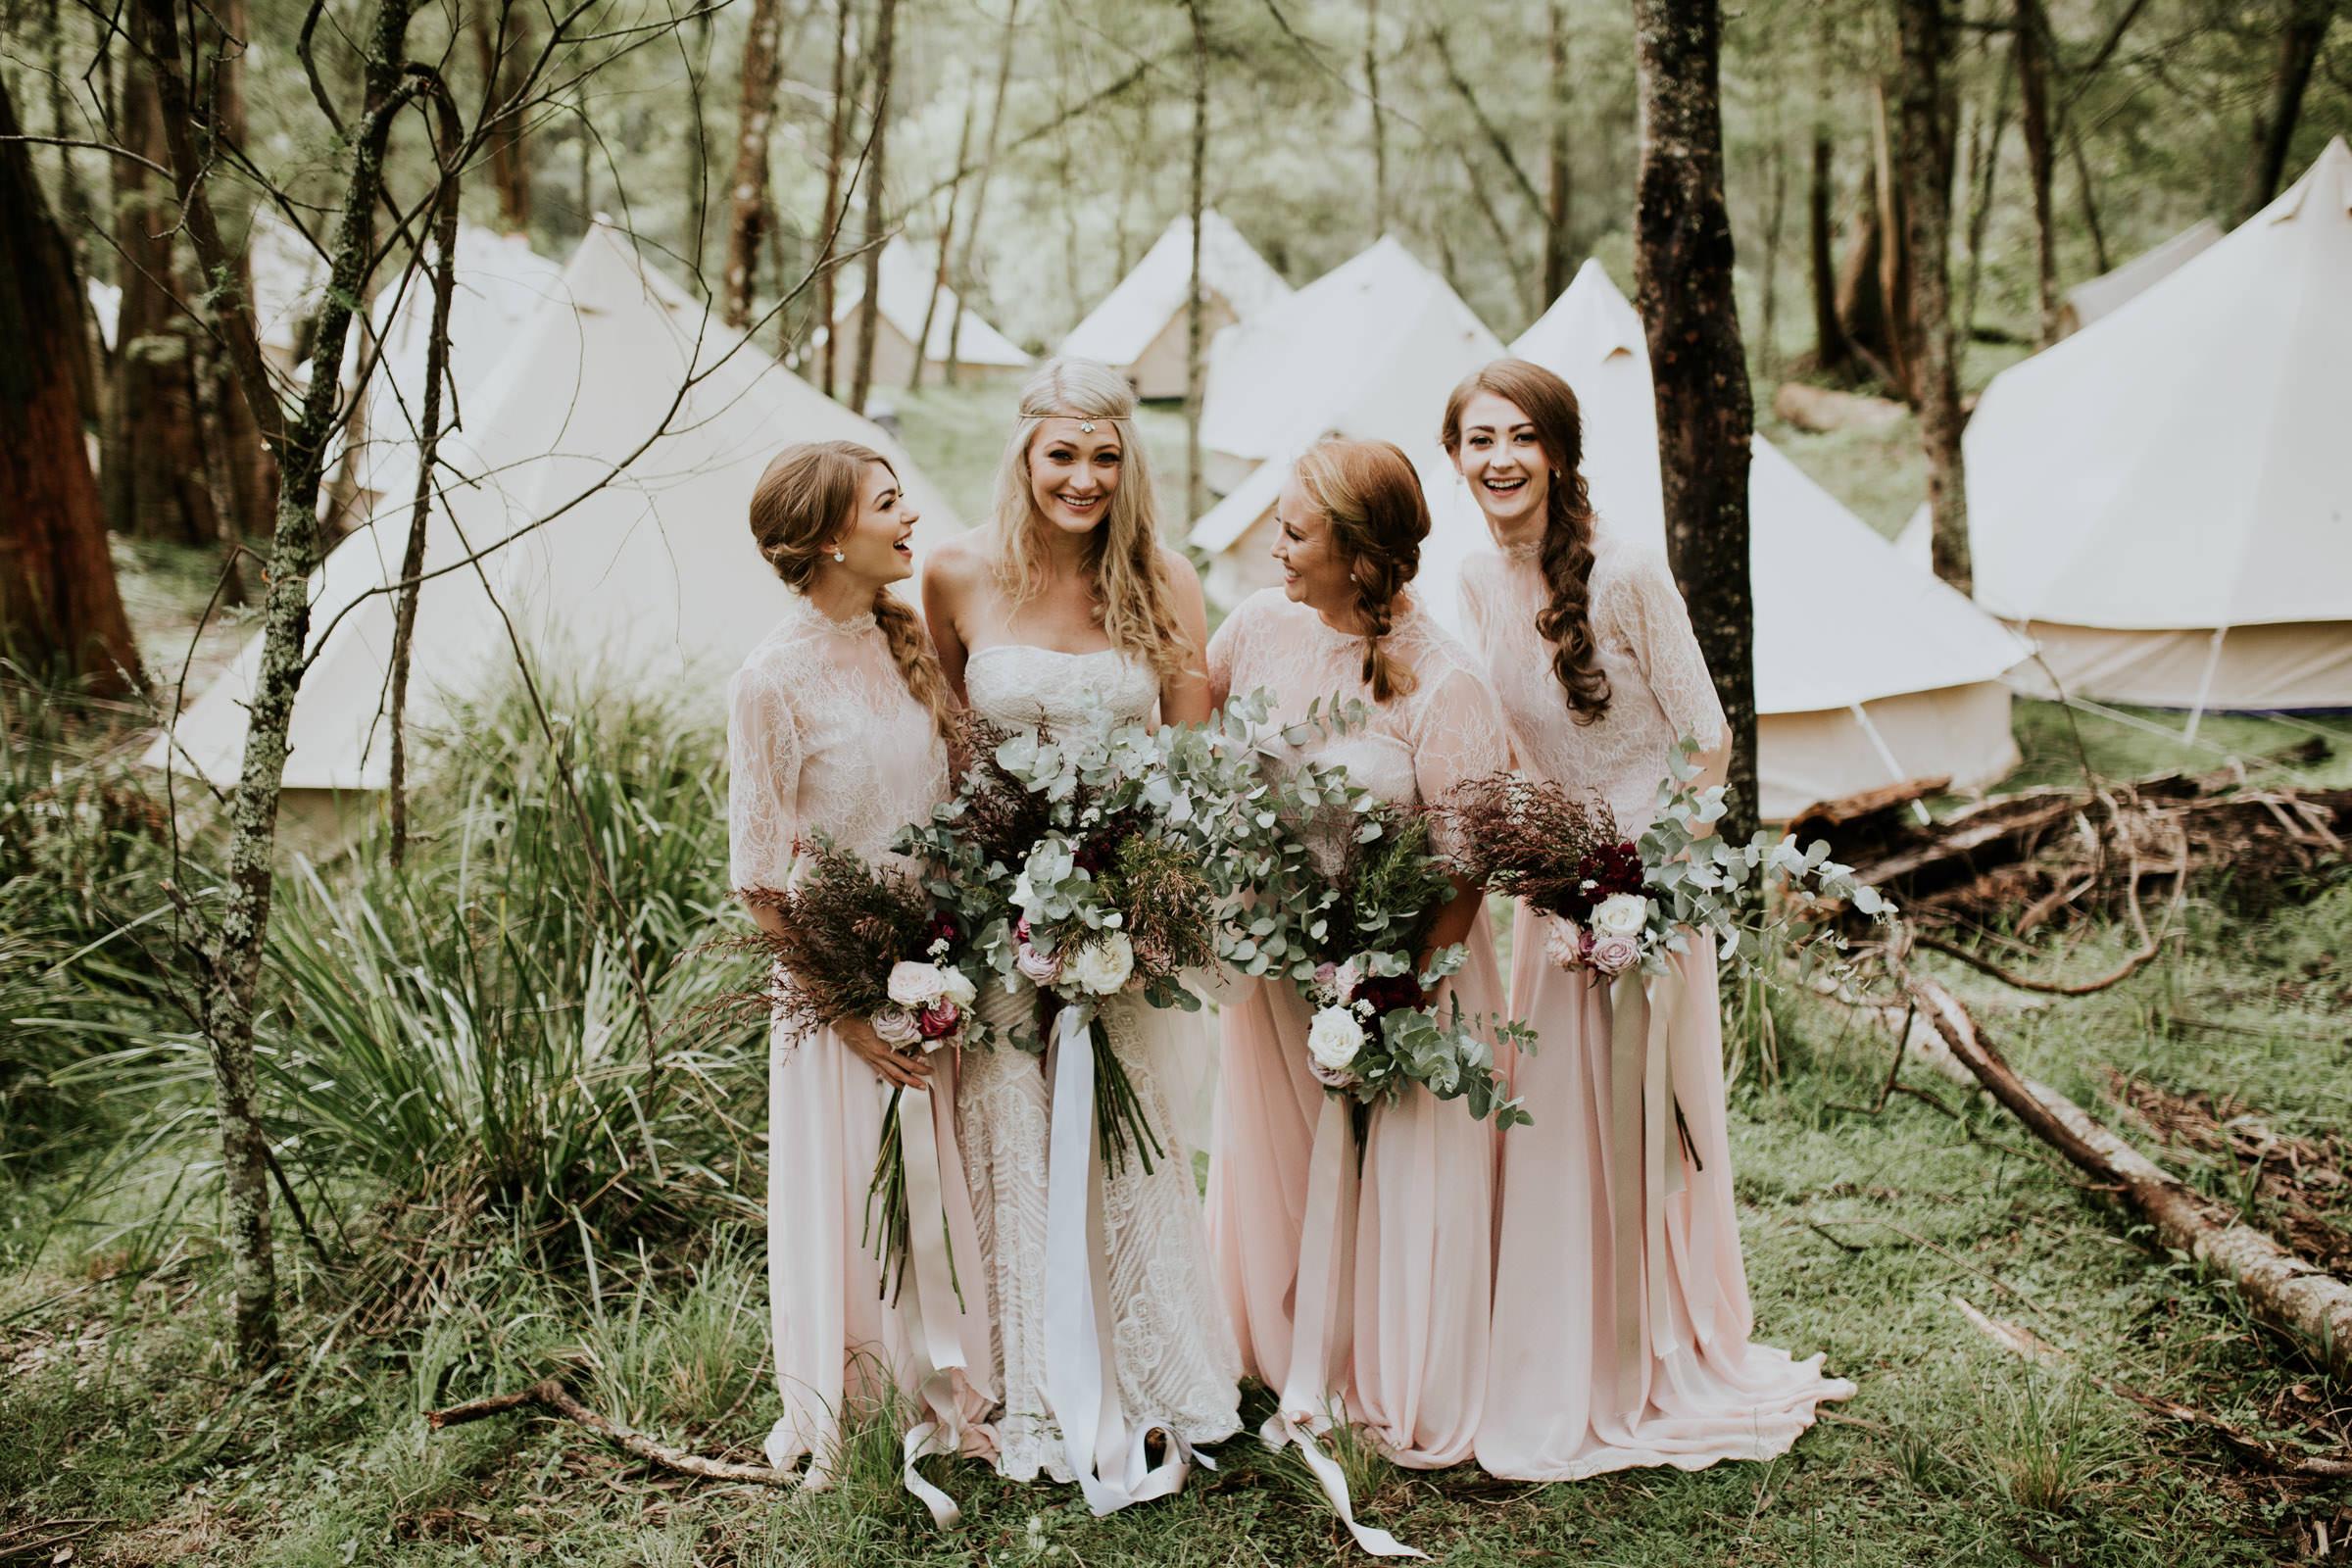 Emma+John+Far+South+Coast+Wedding+Festivl+Glamping+Bush-135.jpg